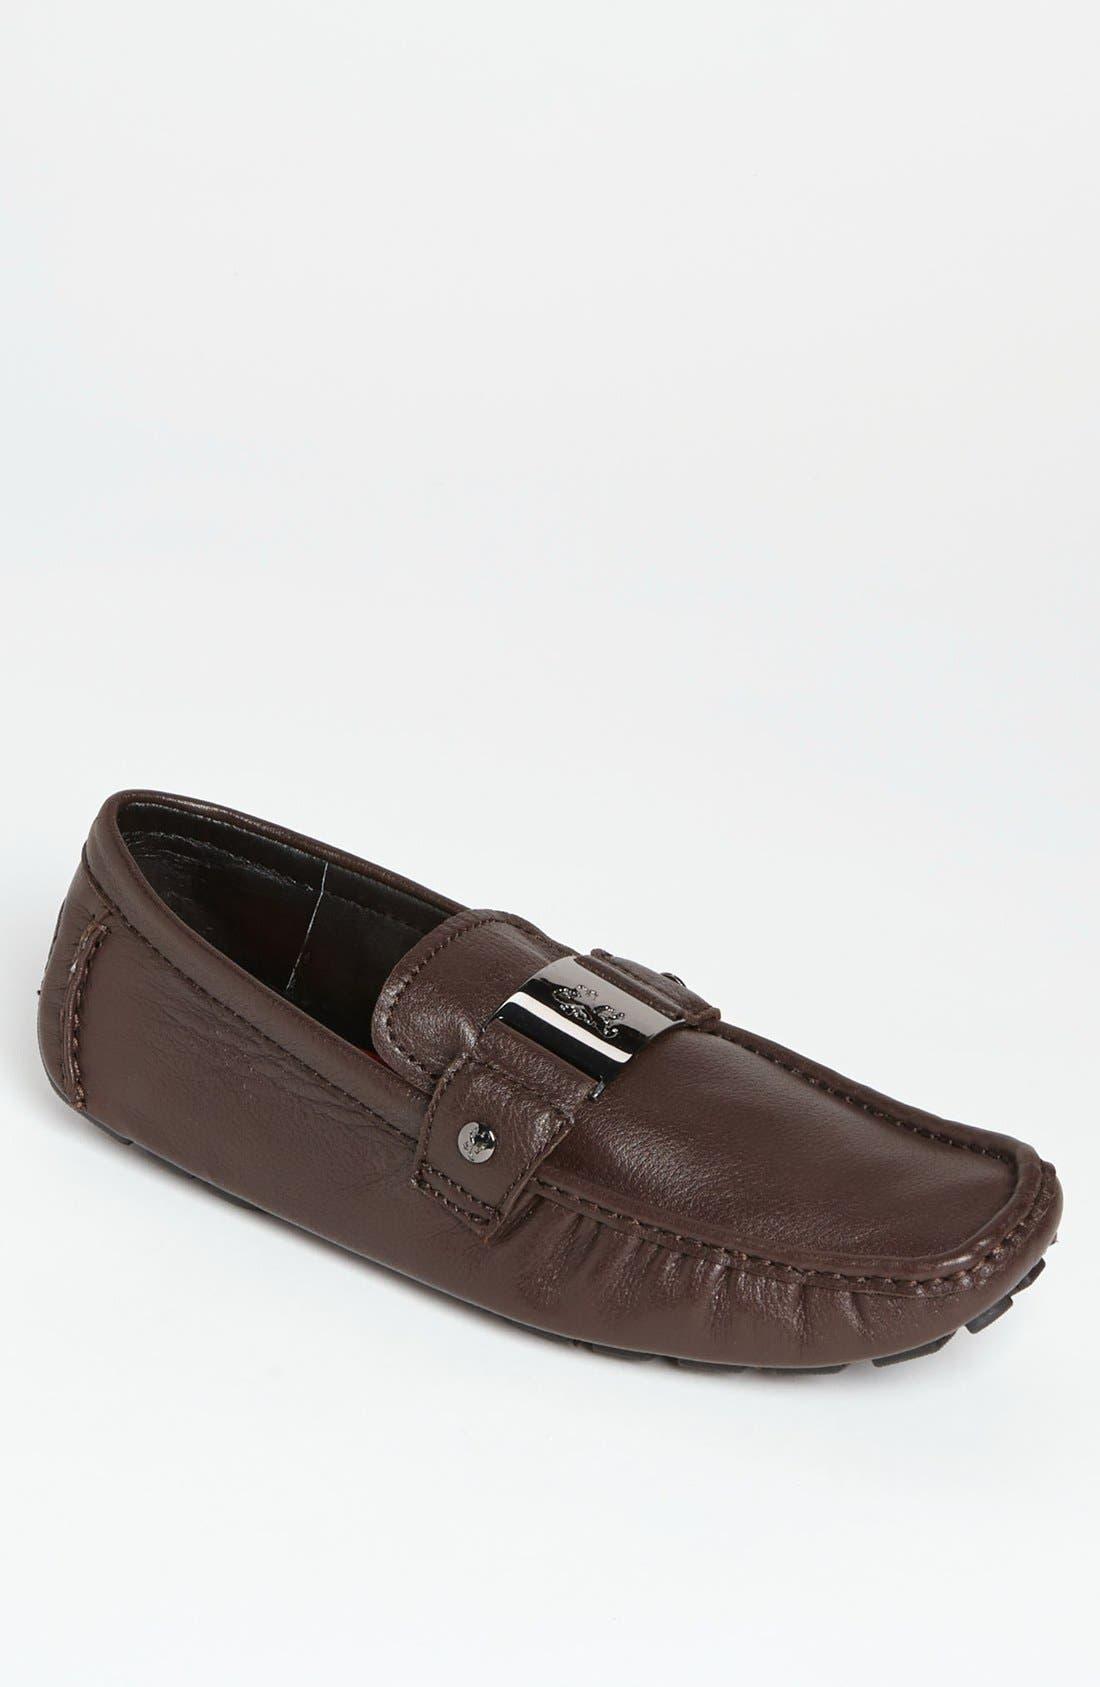 Alternate Image 1 Selected - Bugatchi 'Miro' Driving Shoe